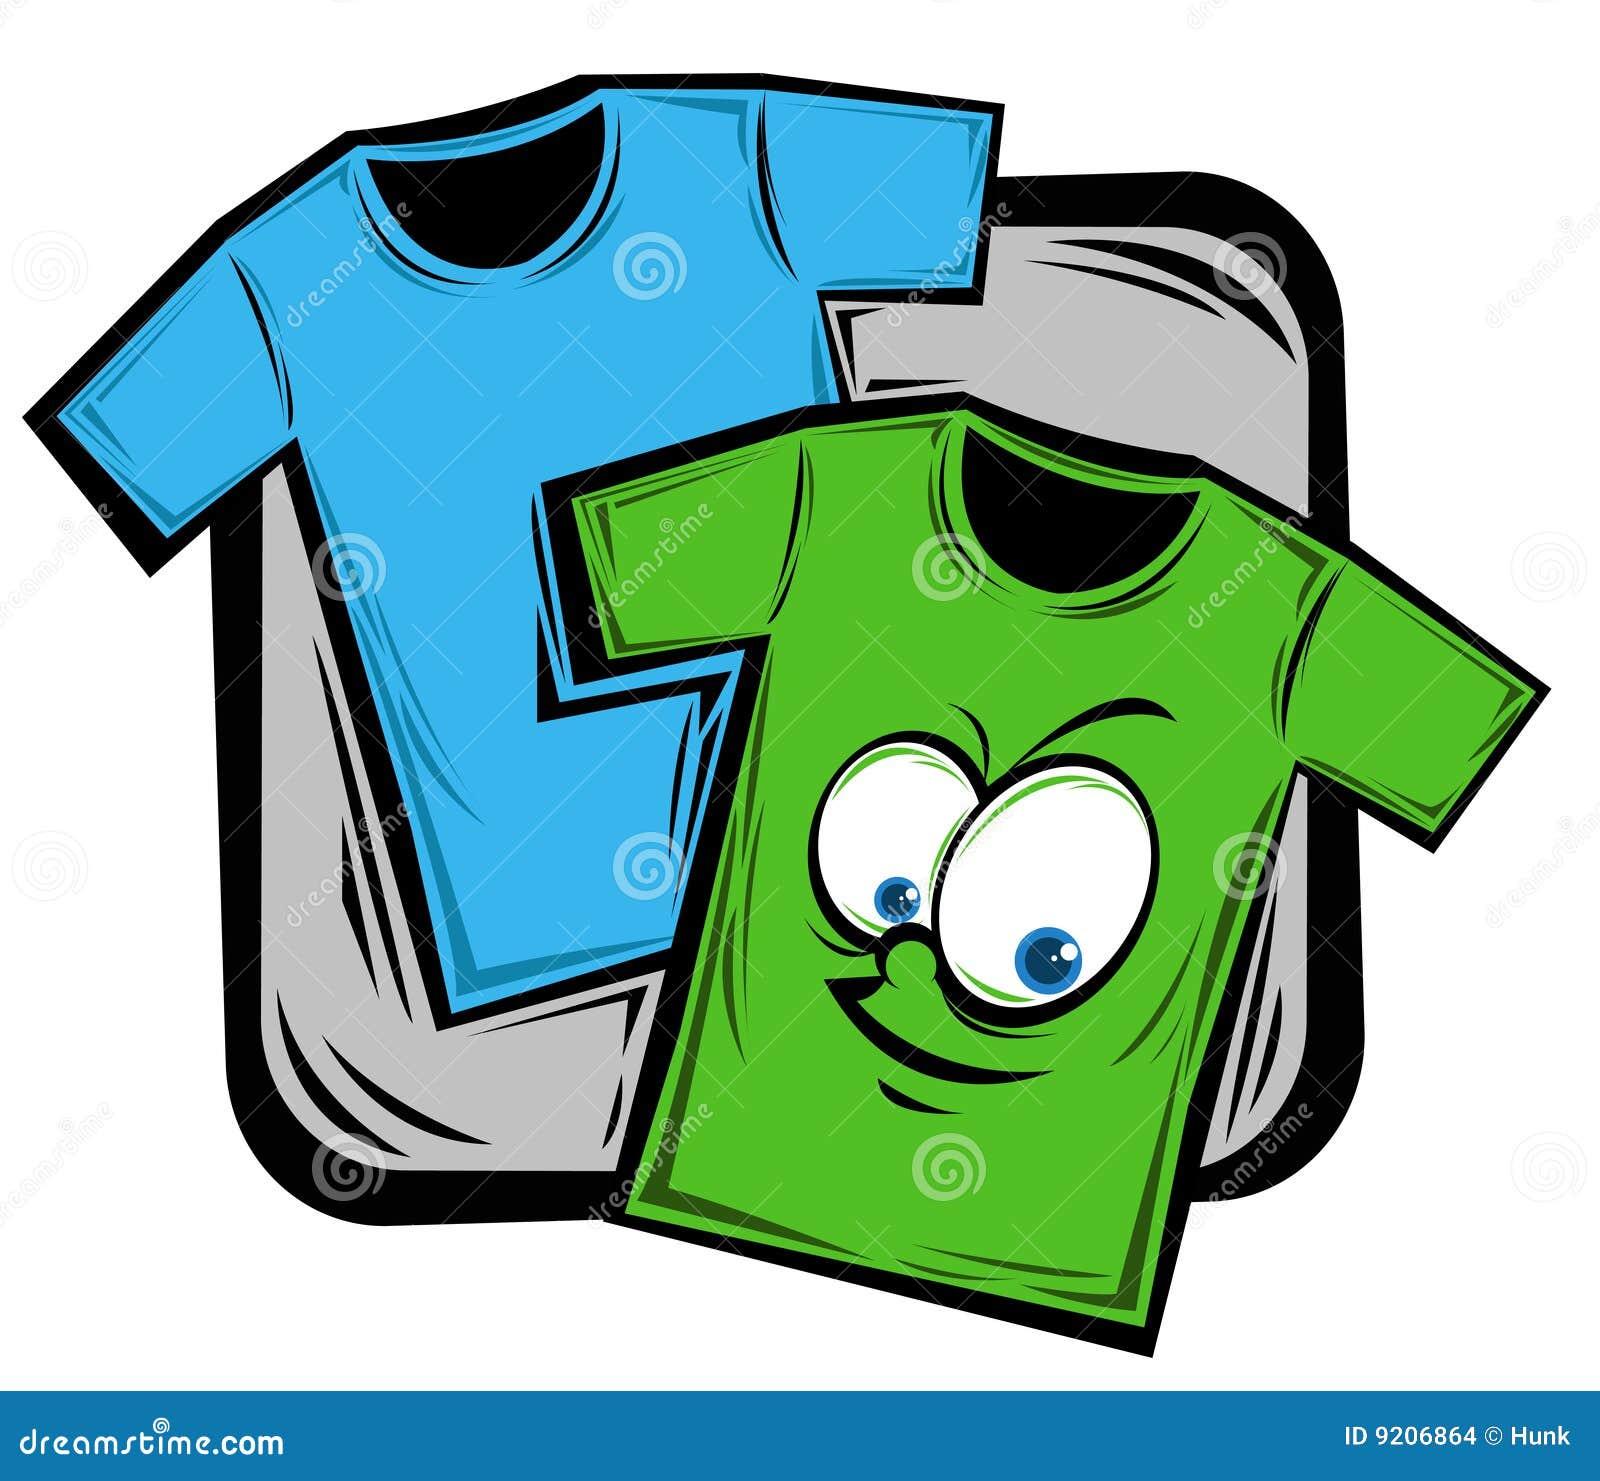 Illustration of cartoon shirt on the background,vector illustration.